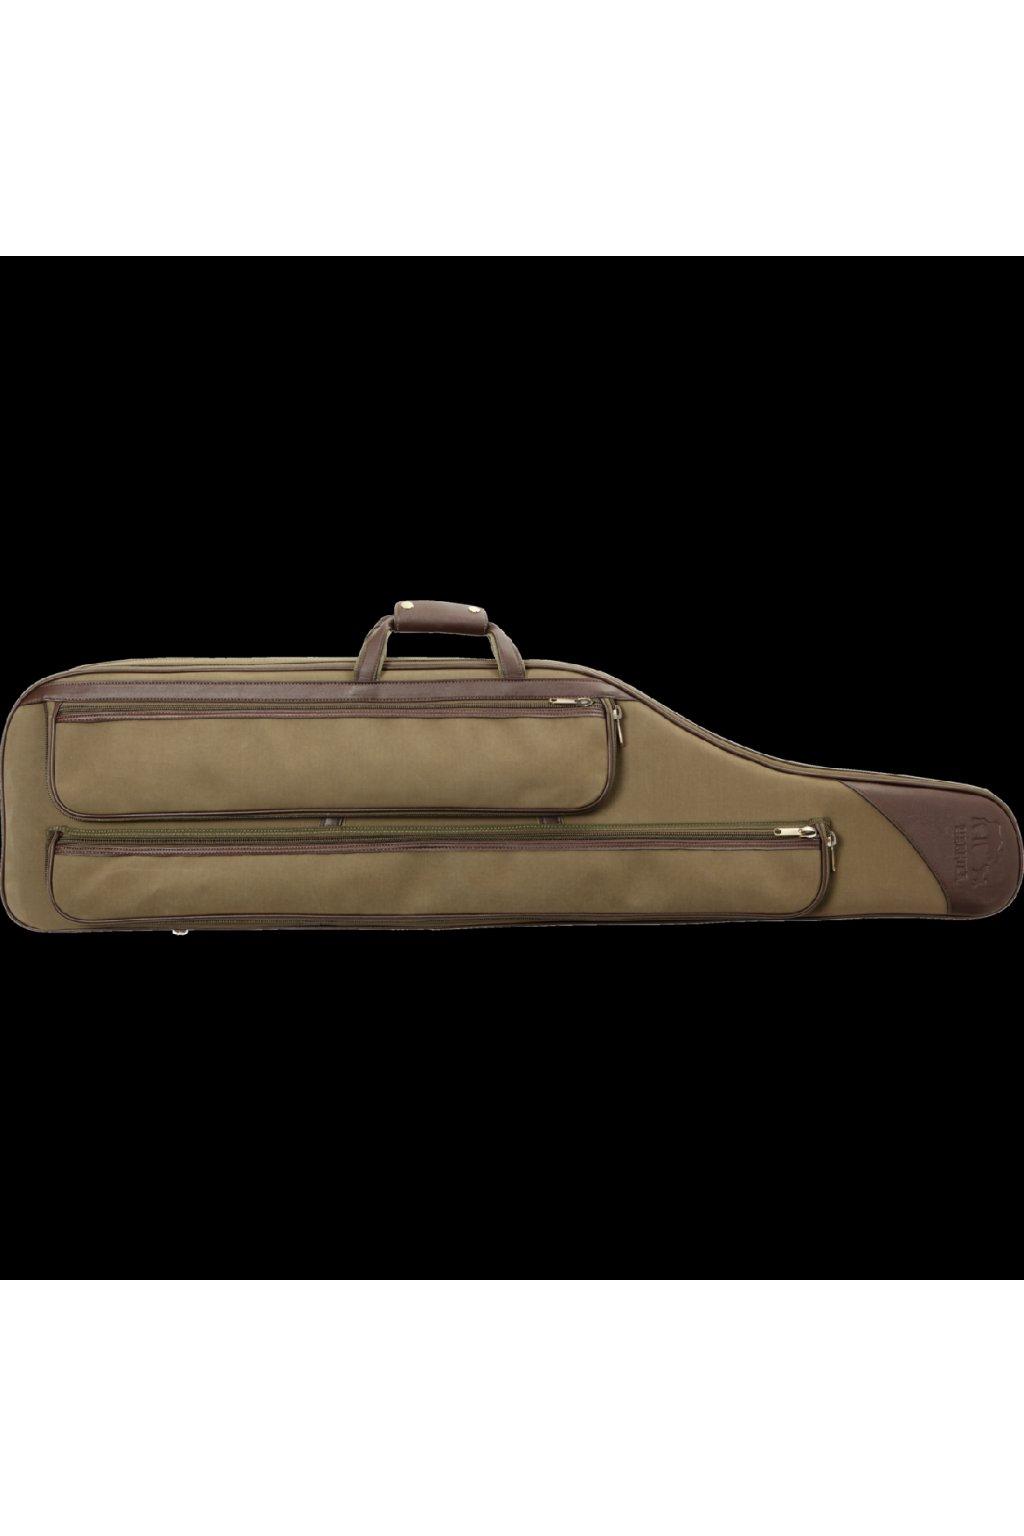 HÄRKILA - pouzdro na zbraň SLIP 125cm s kapsami